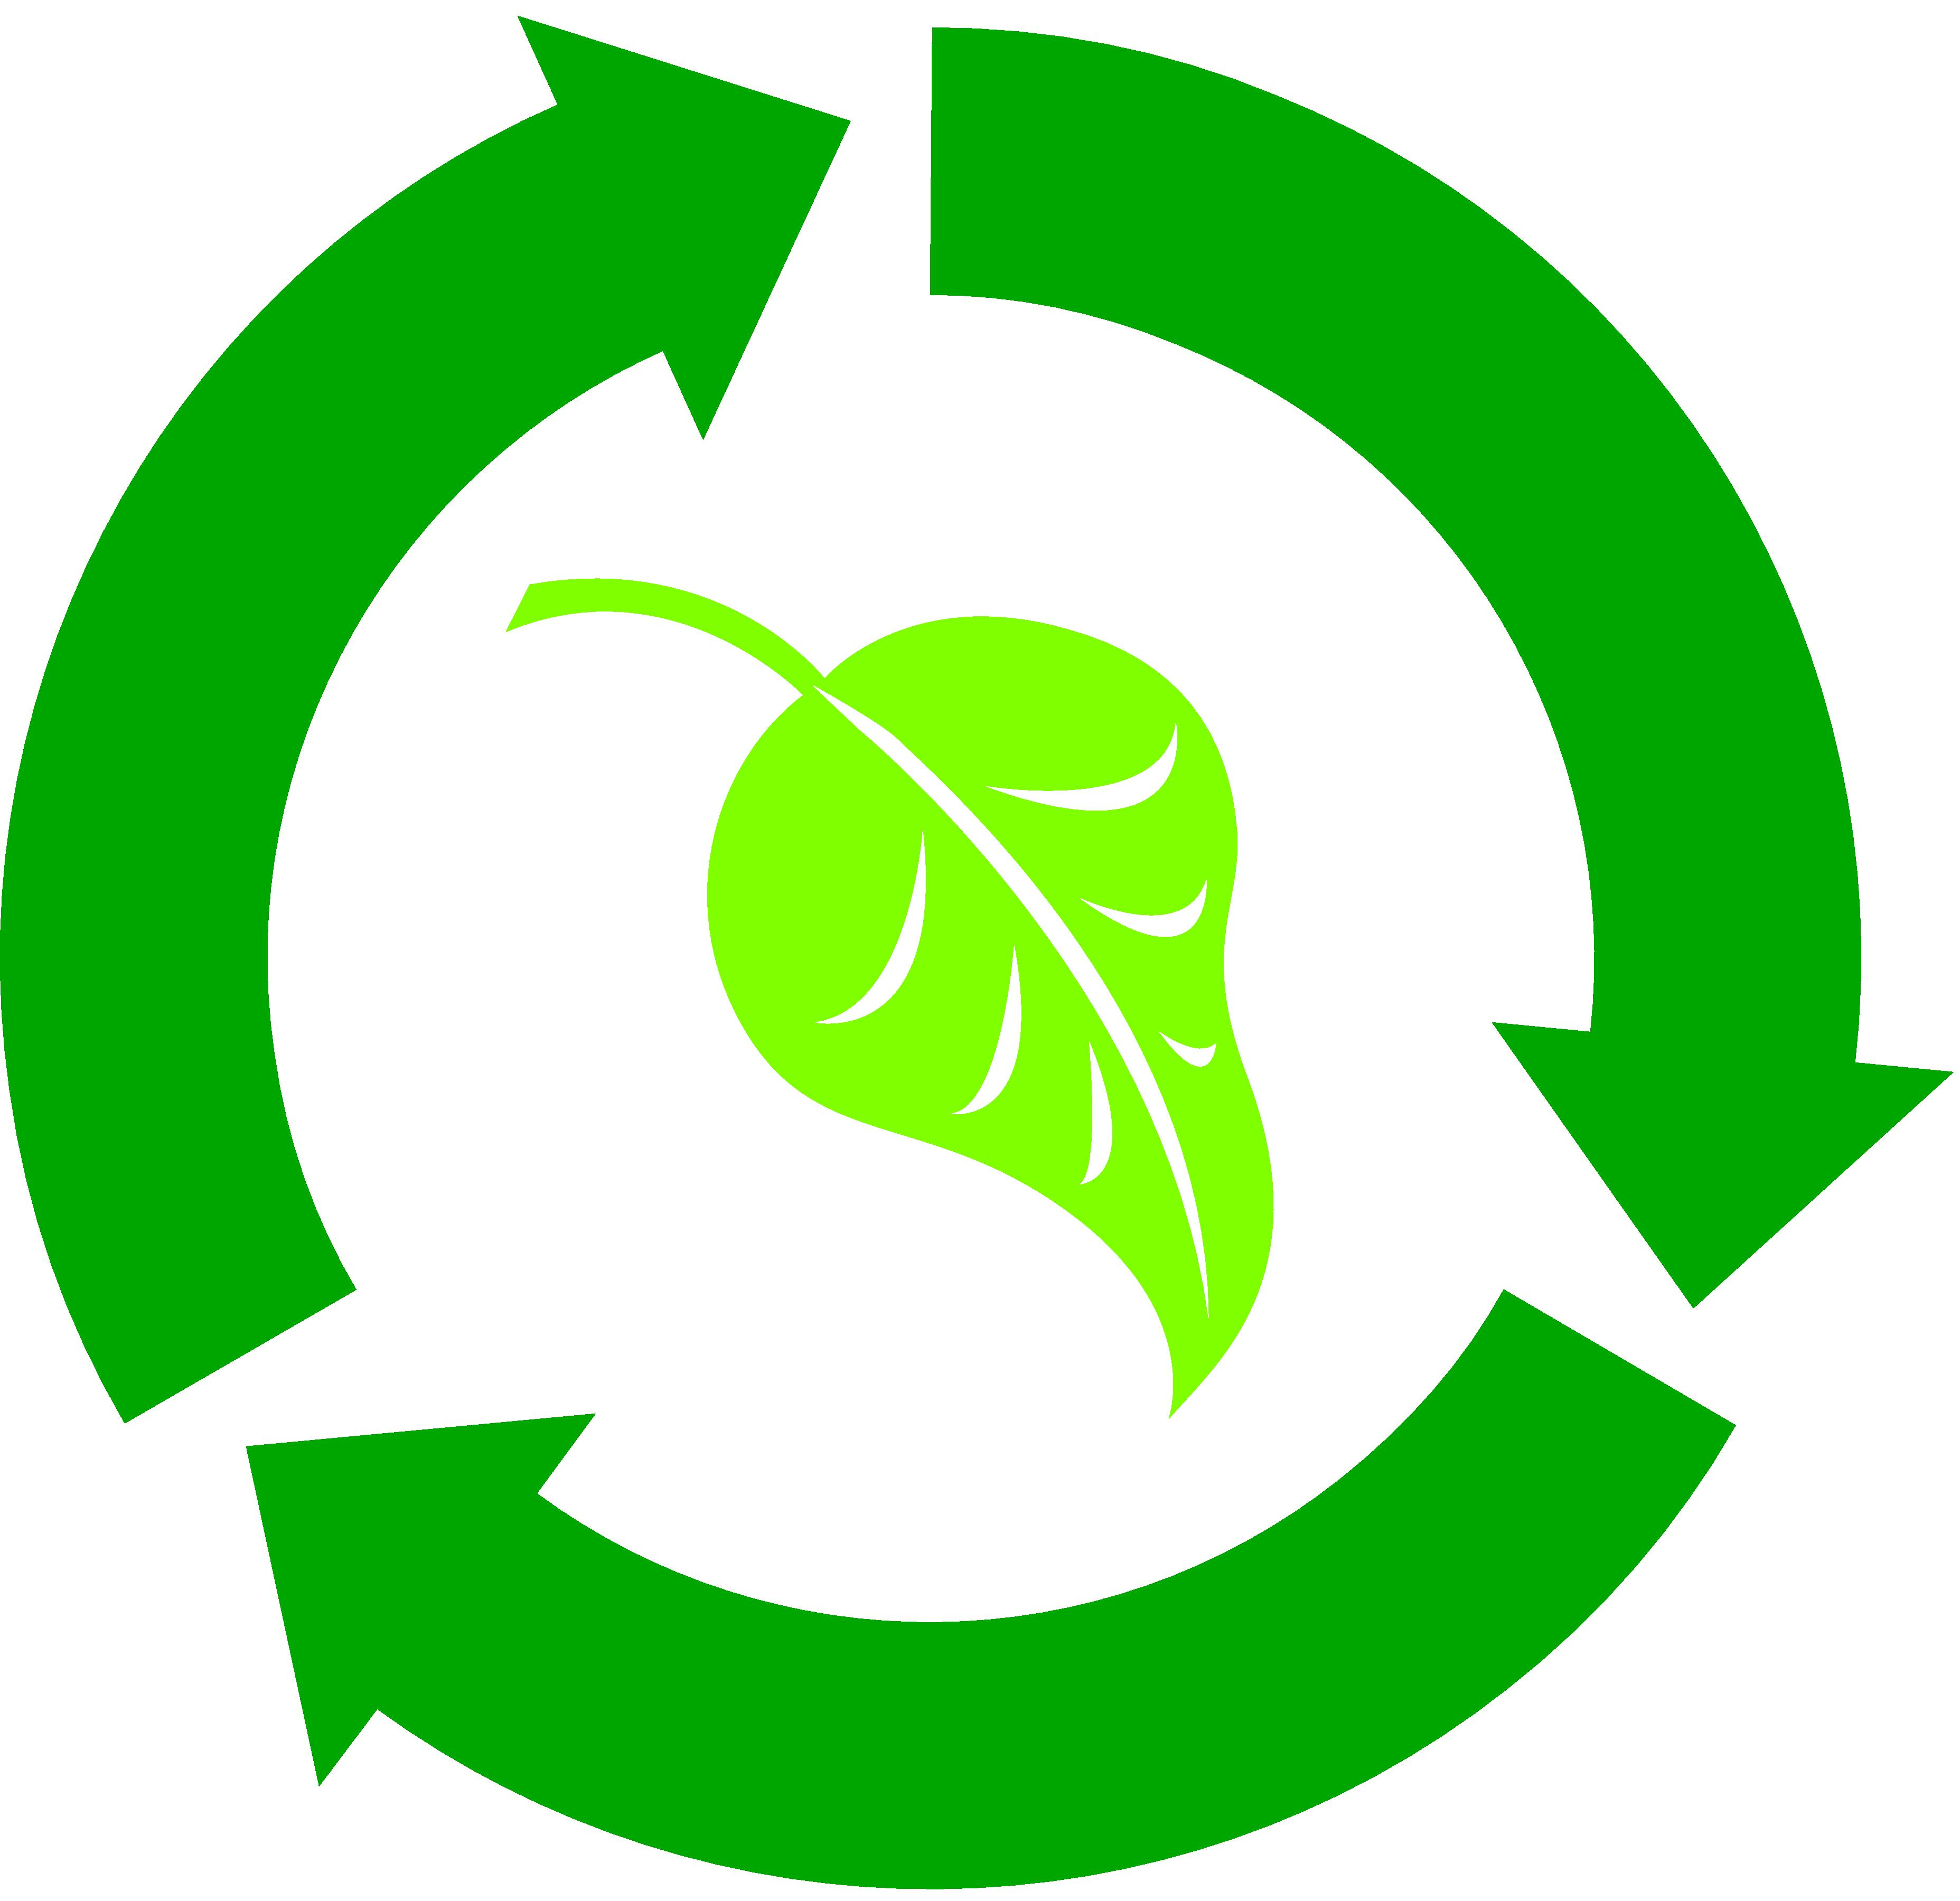 Free environmental logos cliparts. Environment clipart environment logo